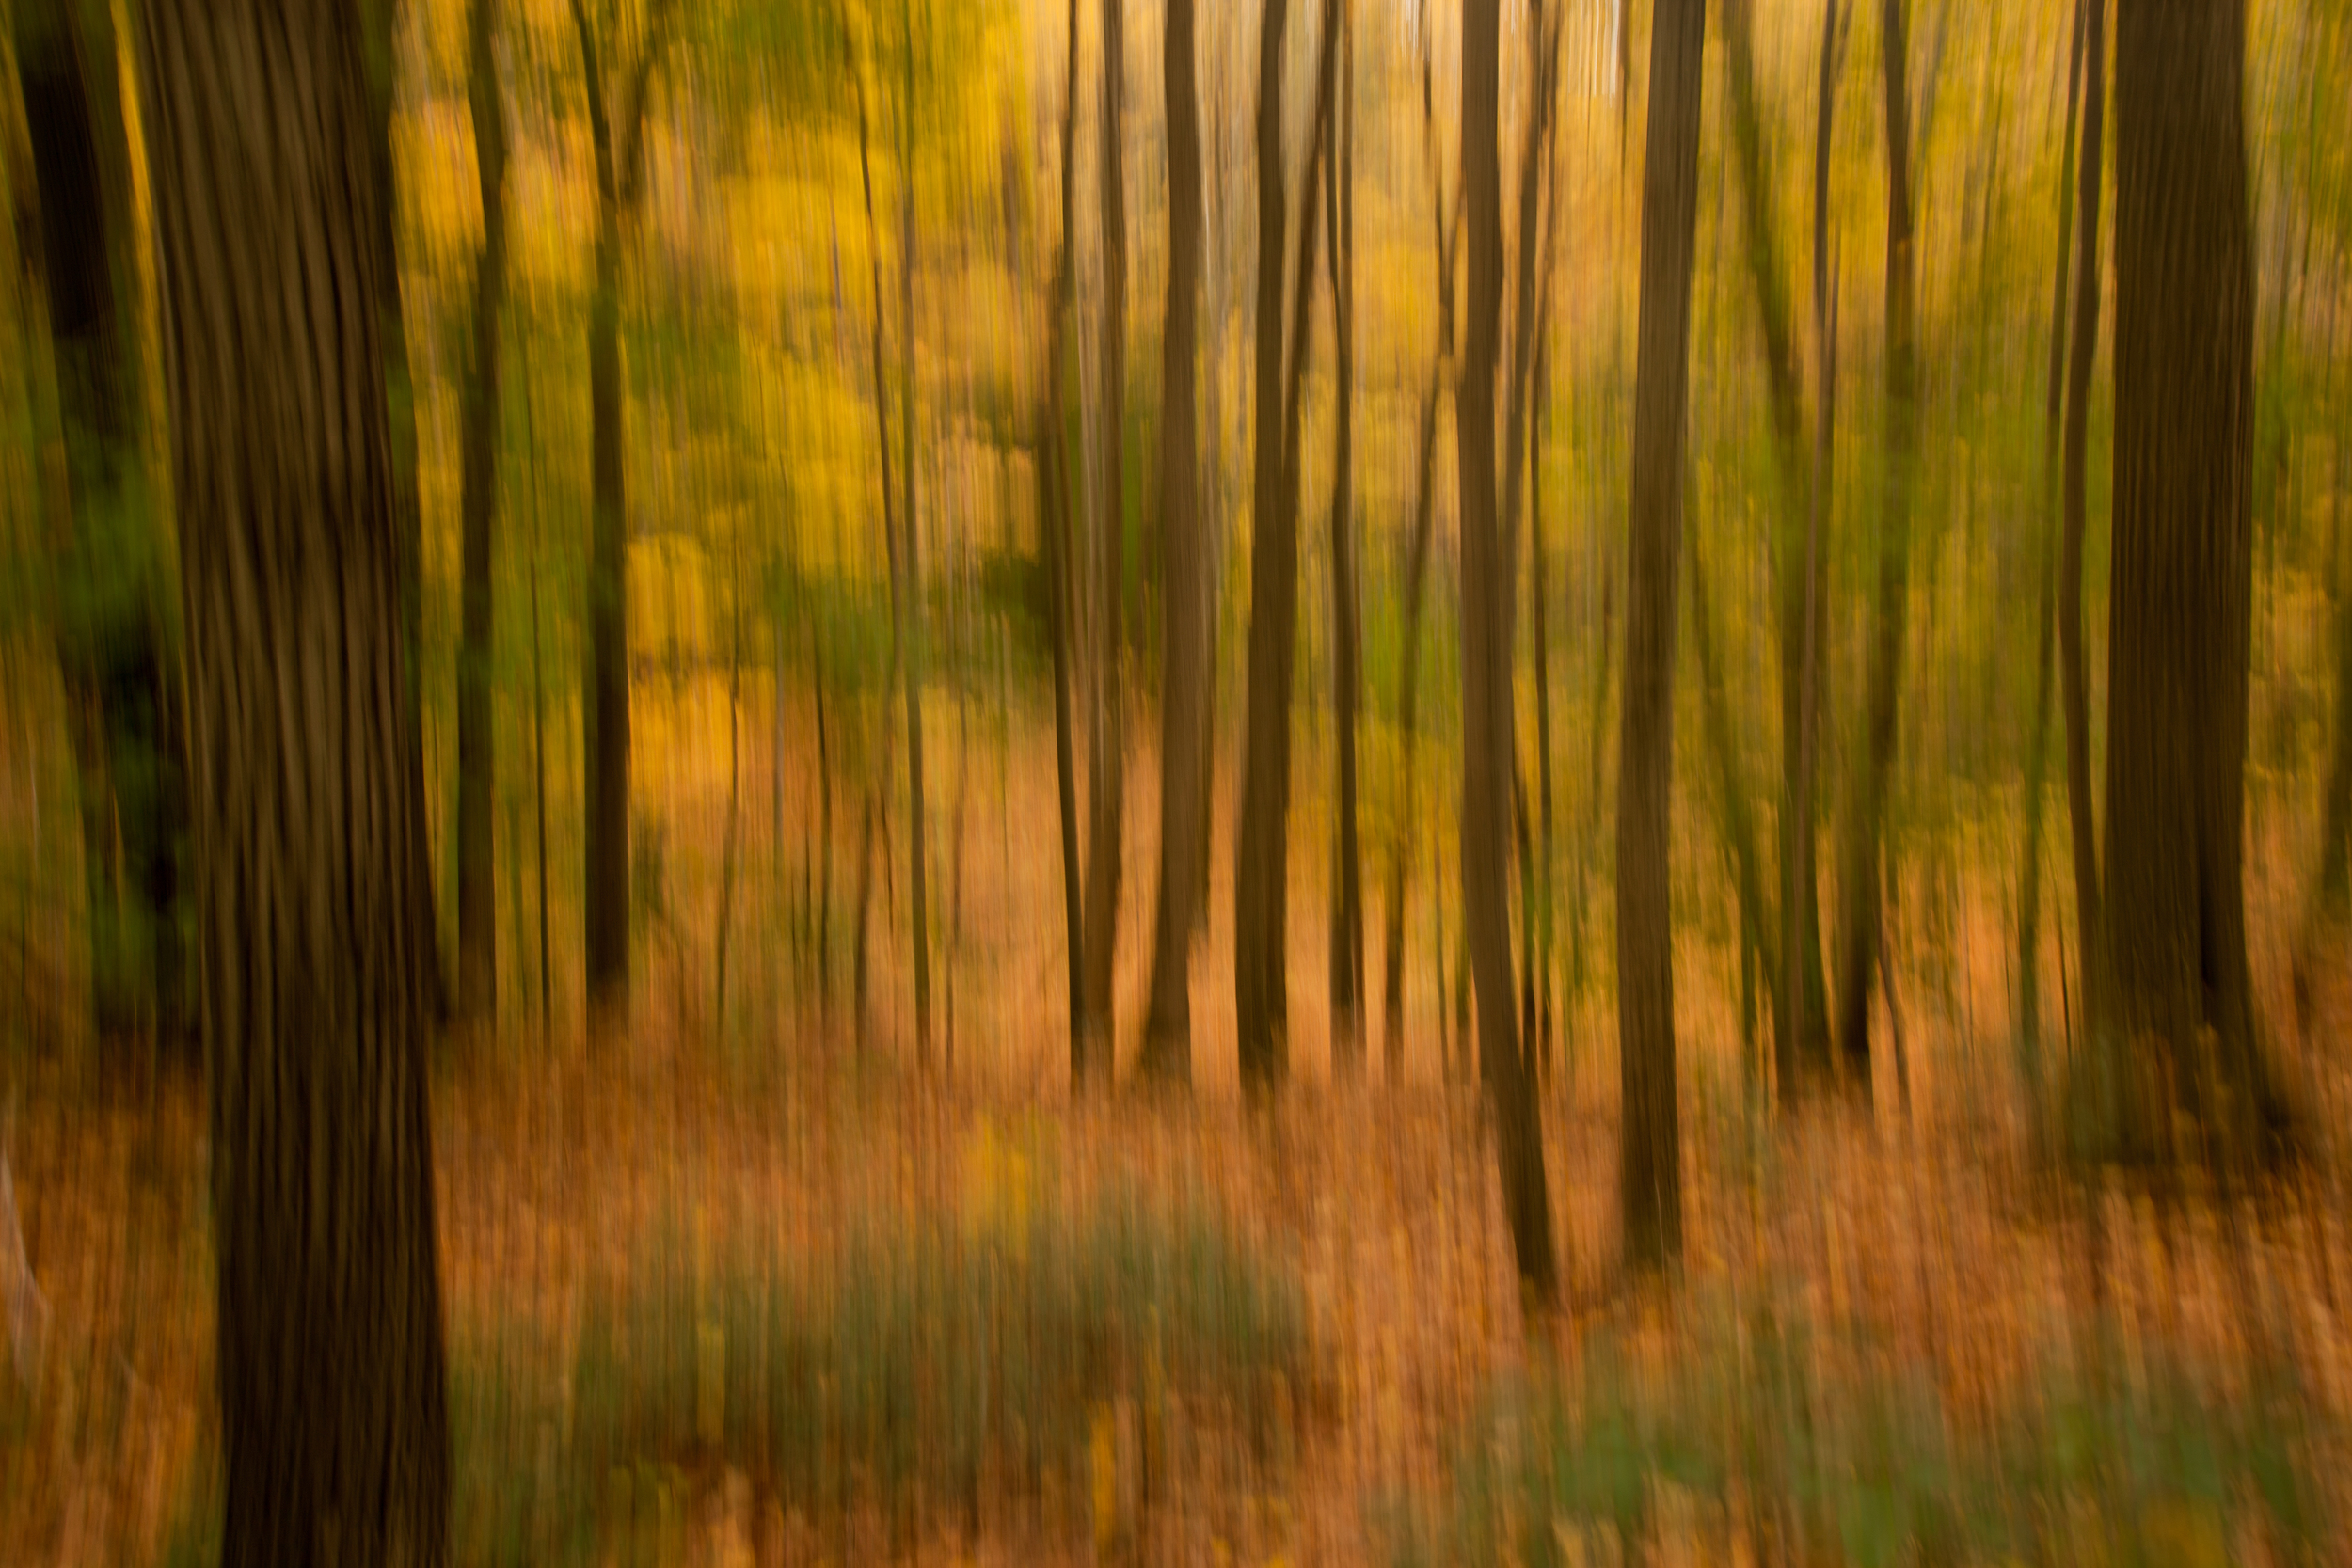 Woodland Impression - Autumn